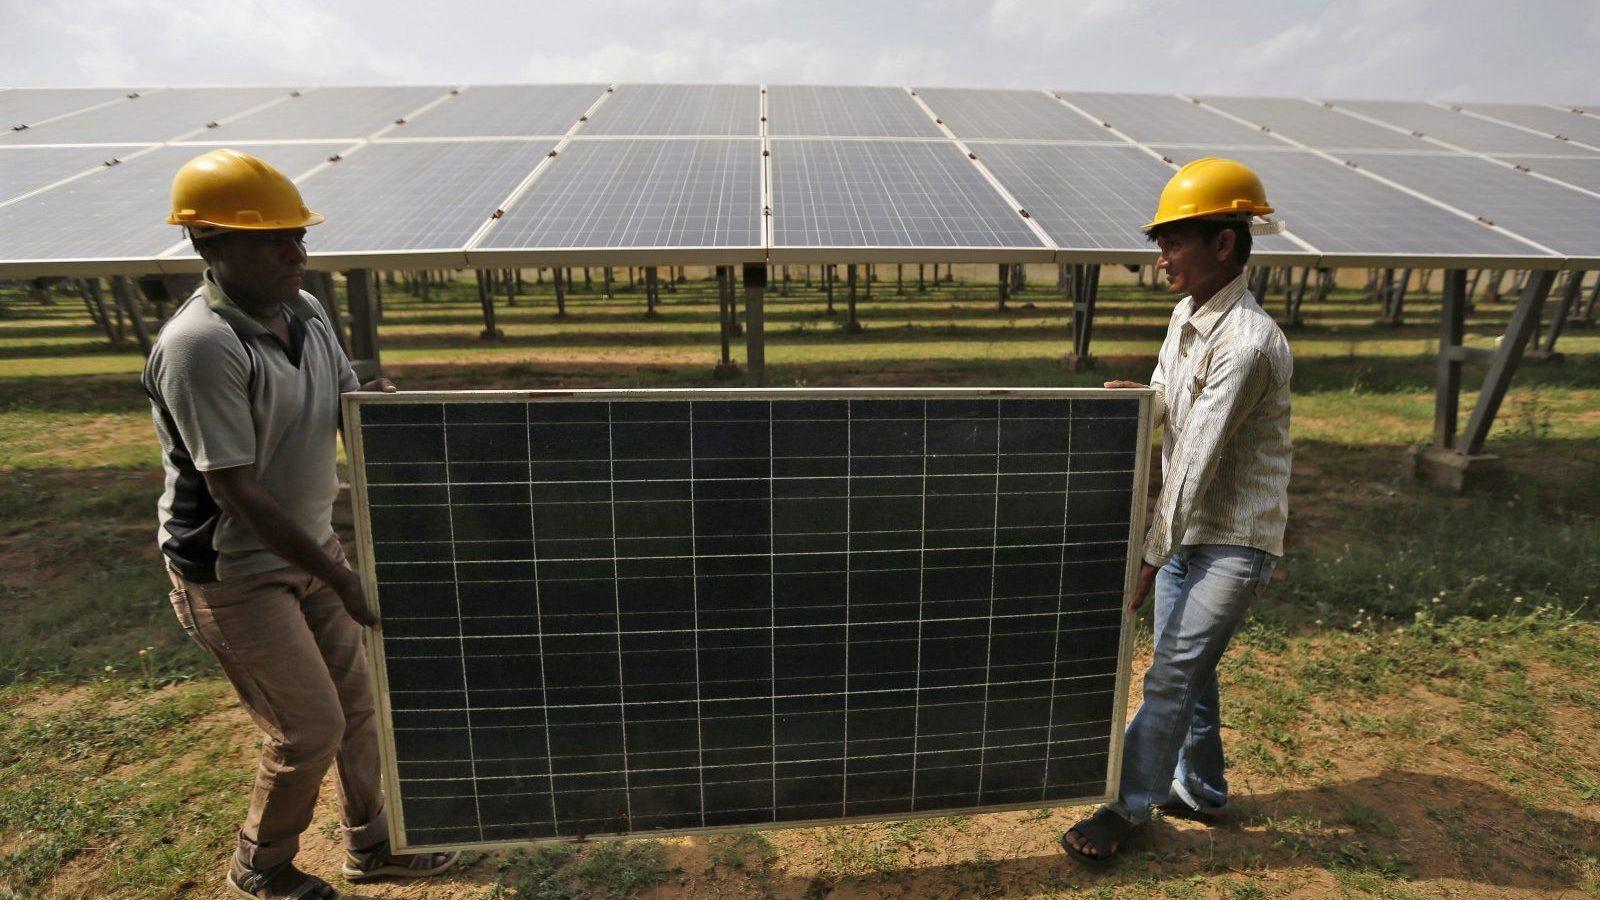 Poor quality solar panels may ruin India's renewable energy boom